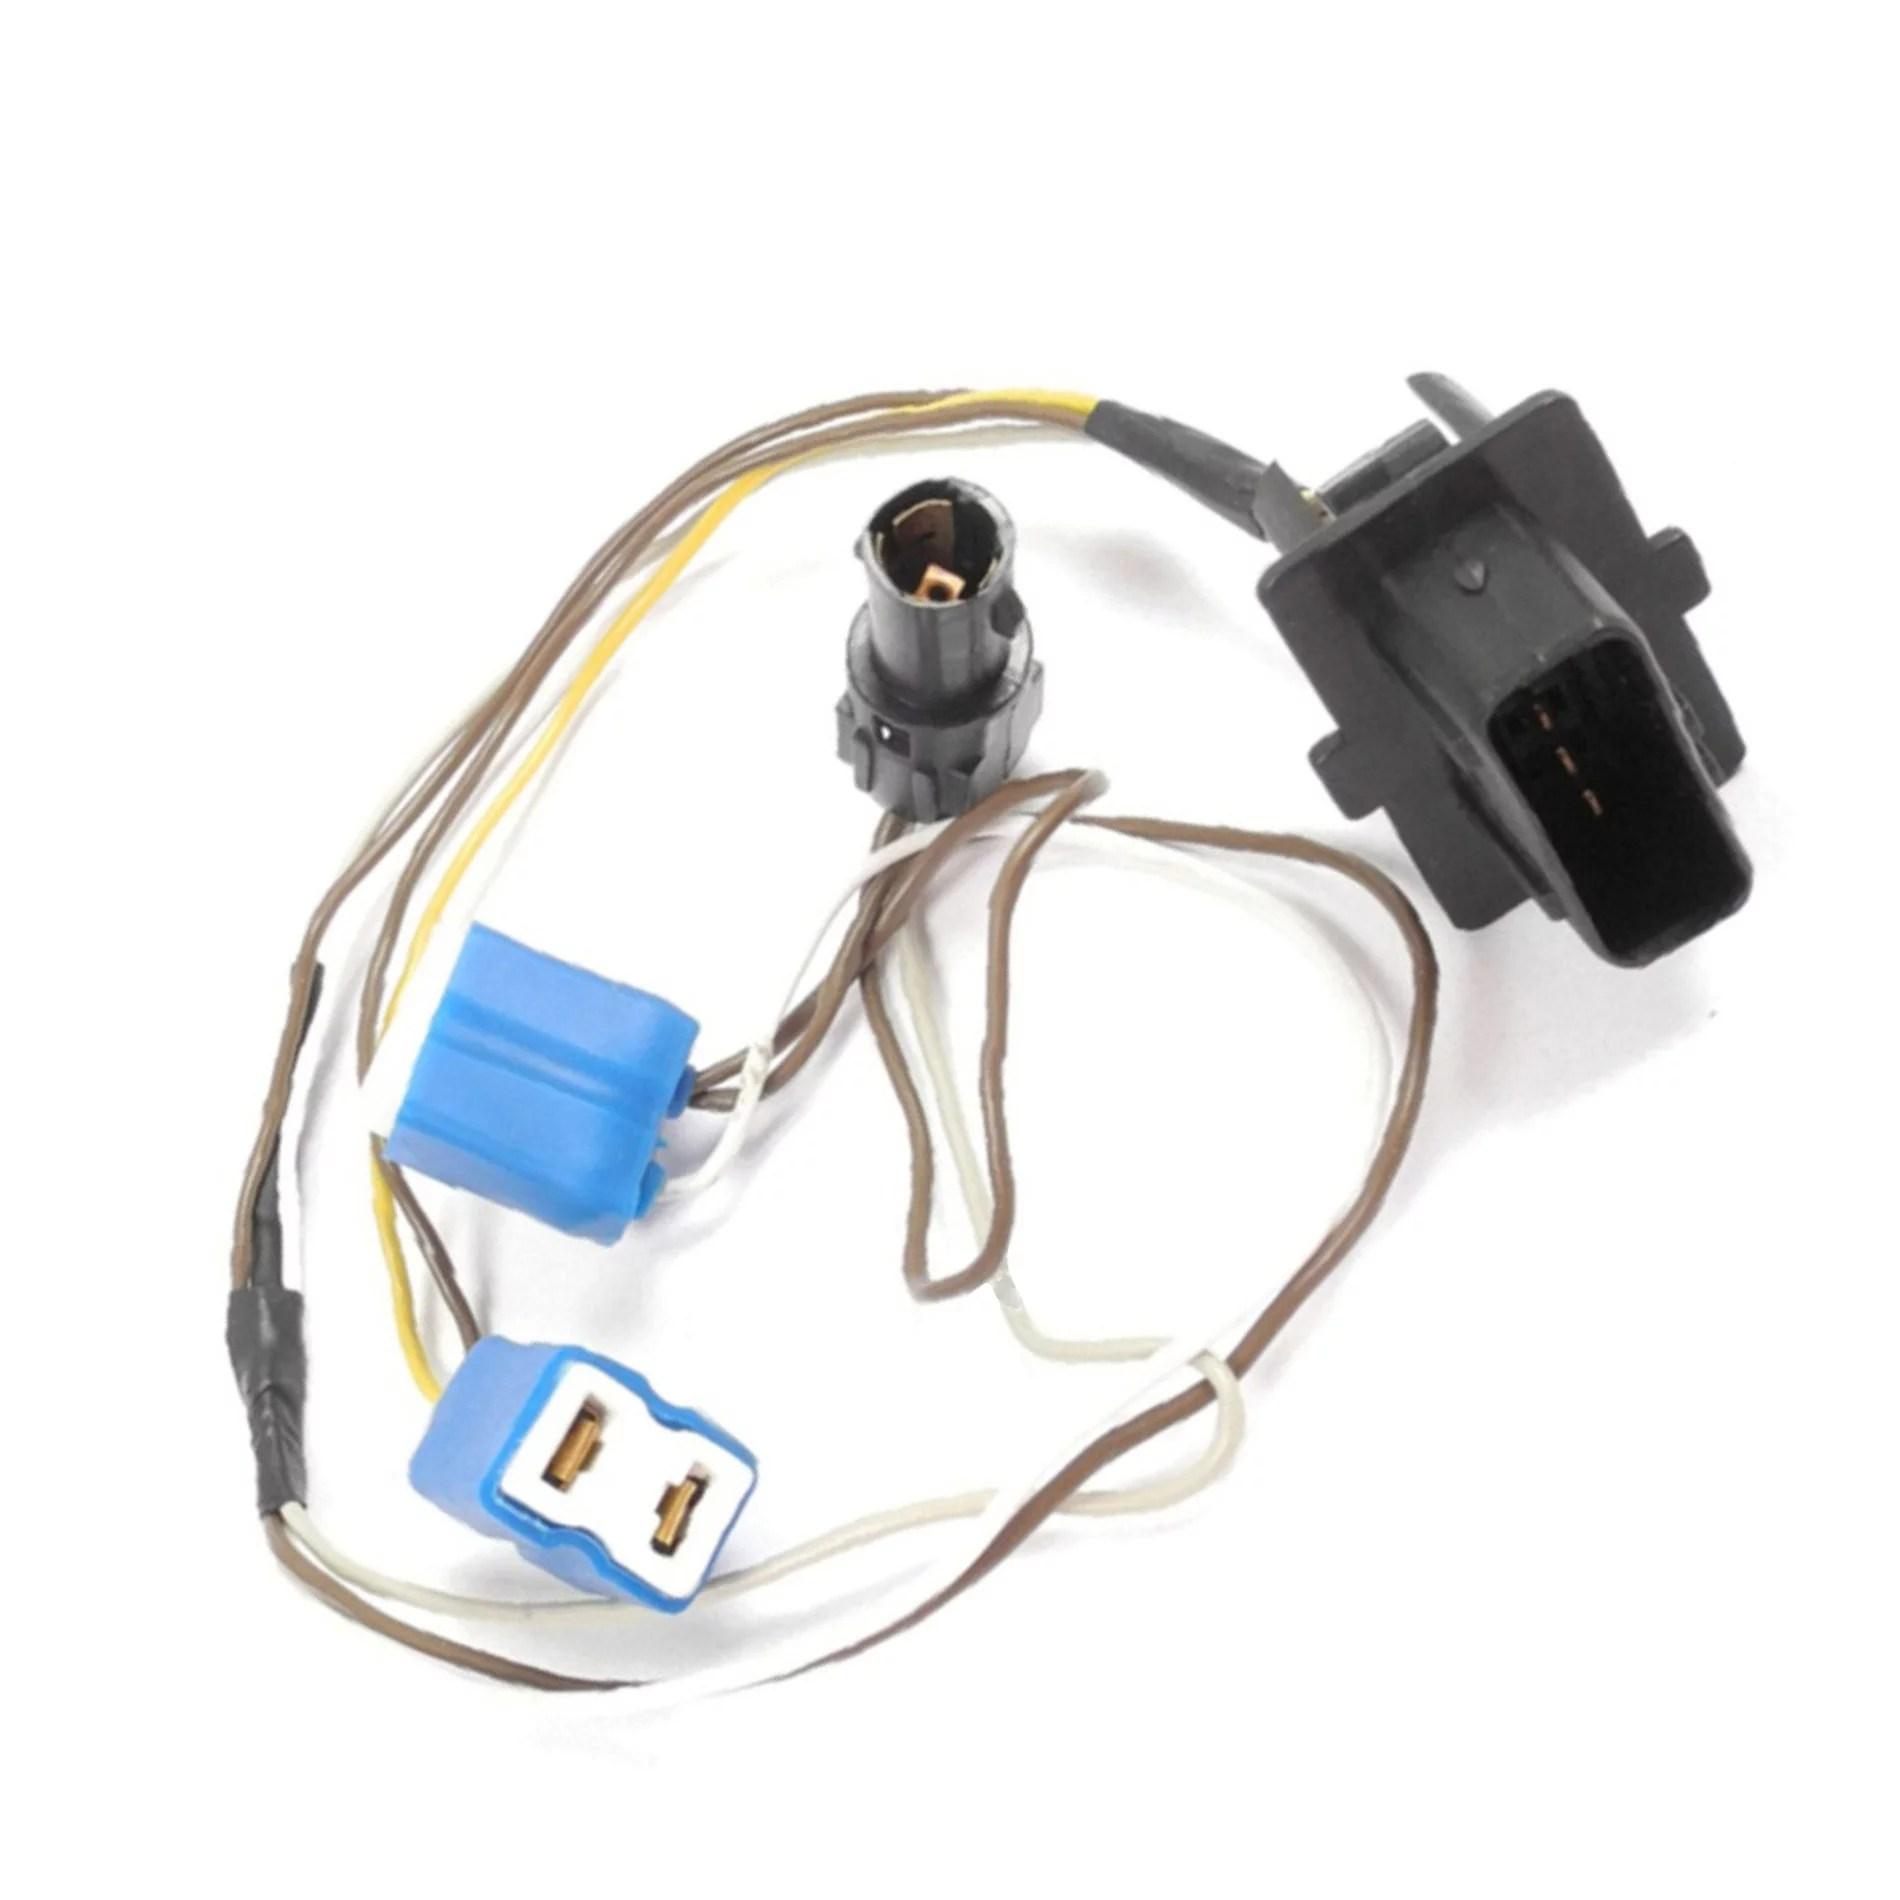 hight resolution of brand new for mercedes benz e430 e420 w210 left headlight wire harness ceramic connector walmart com